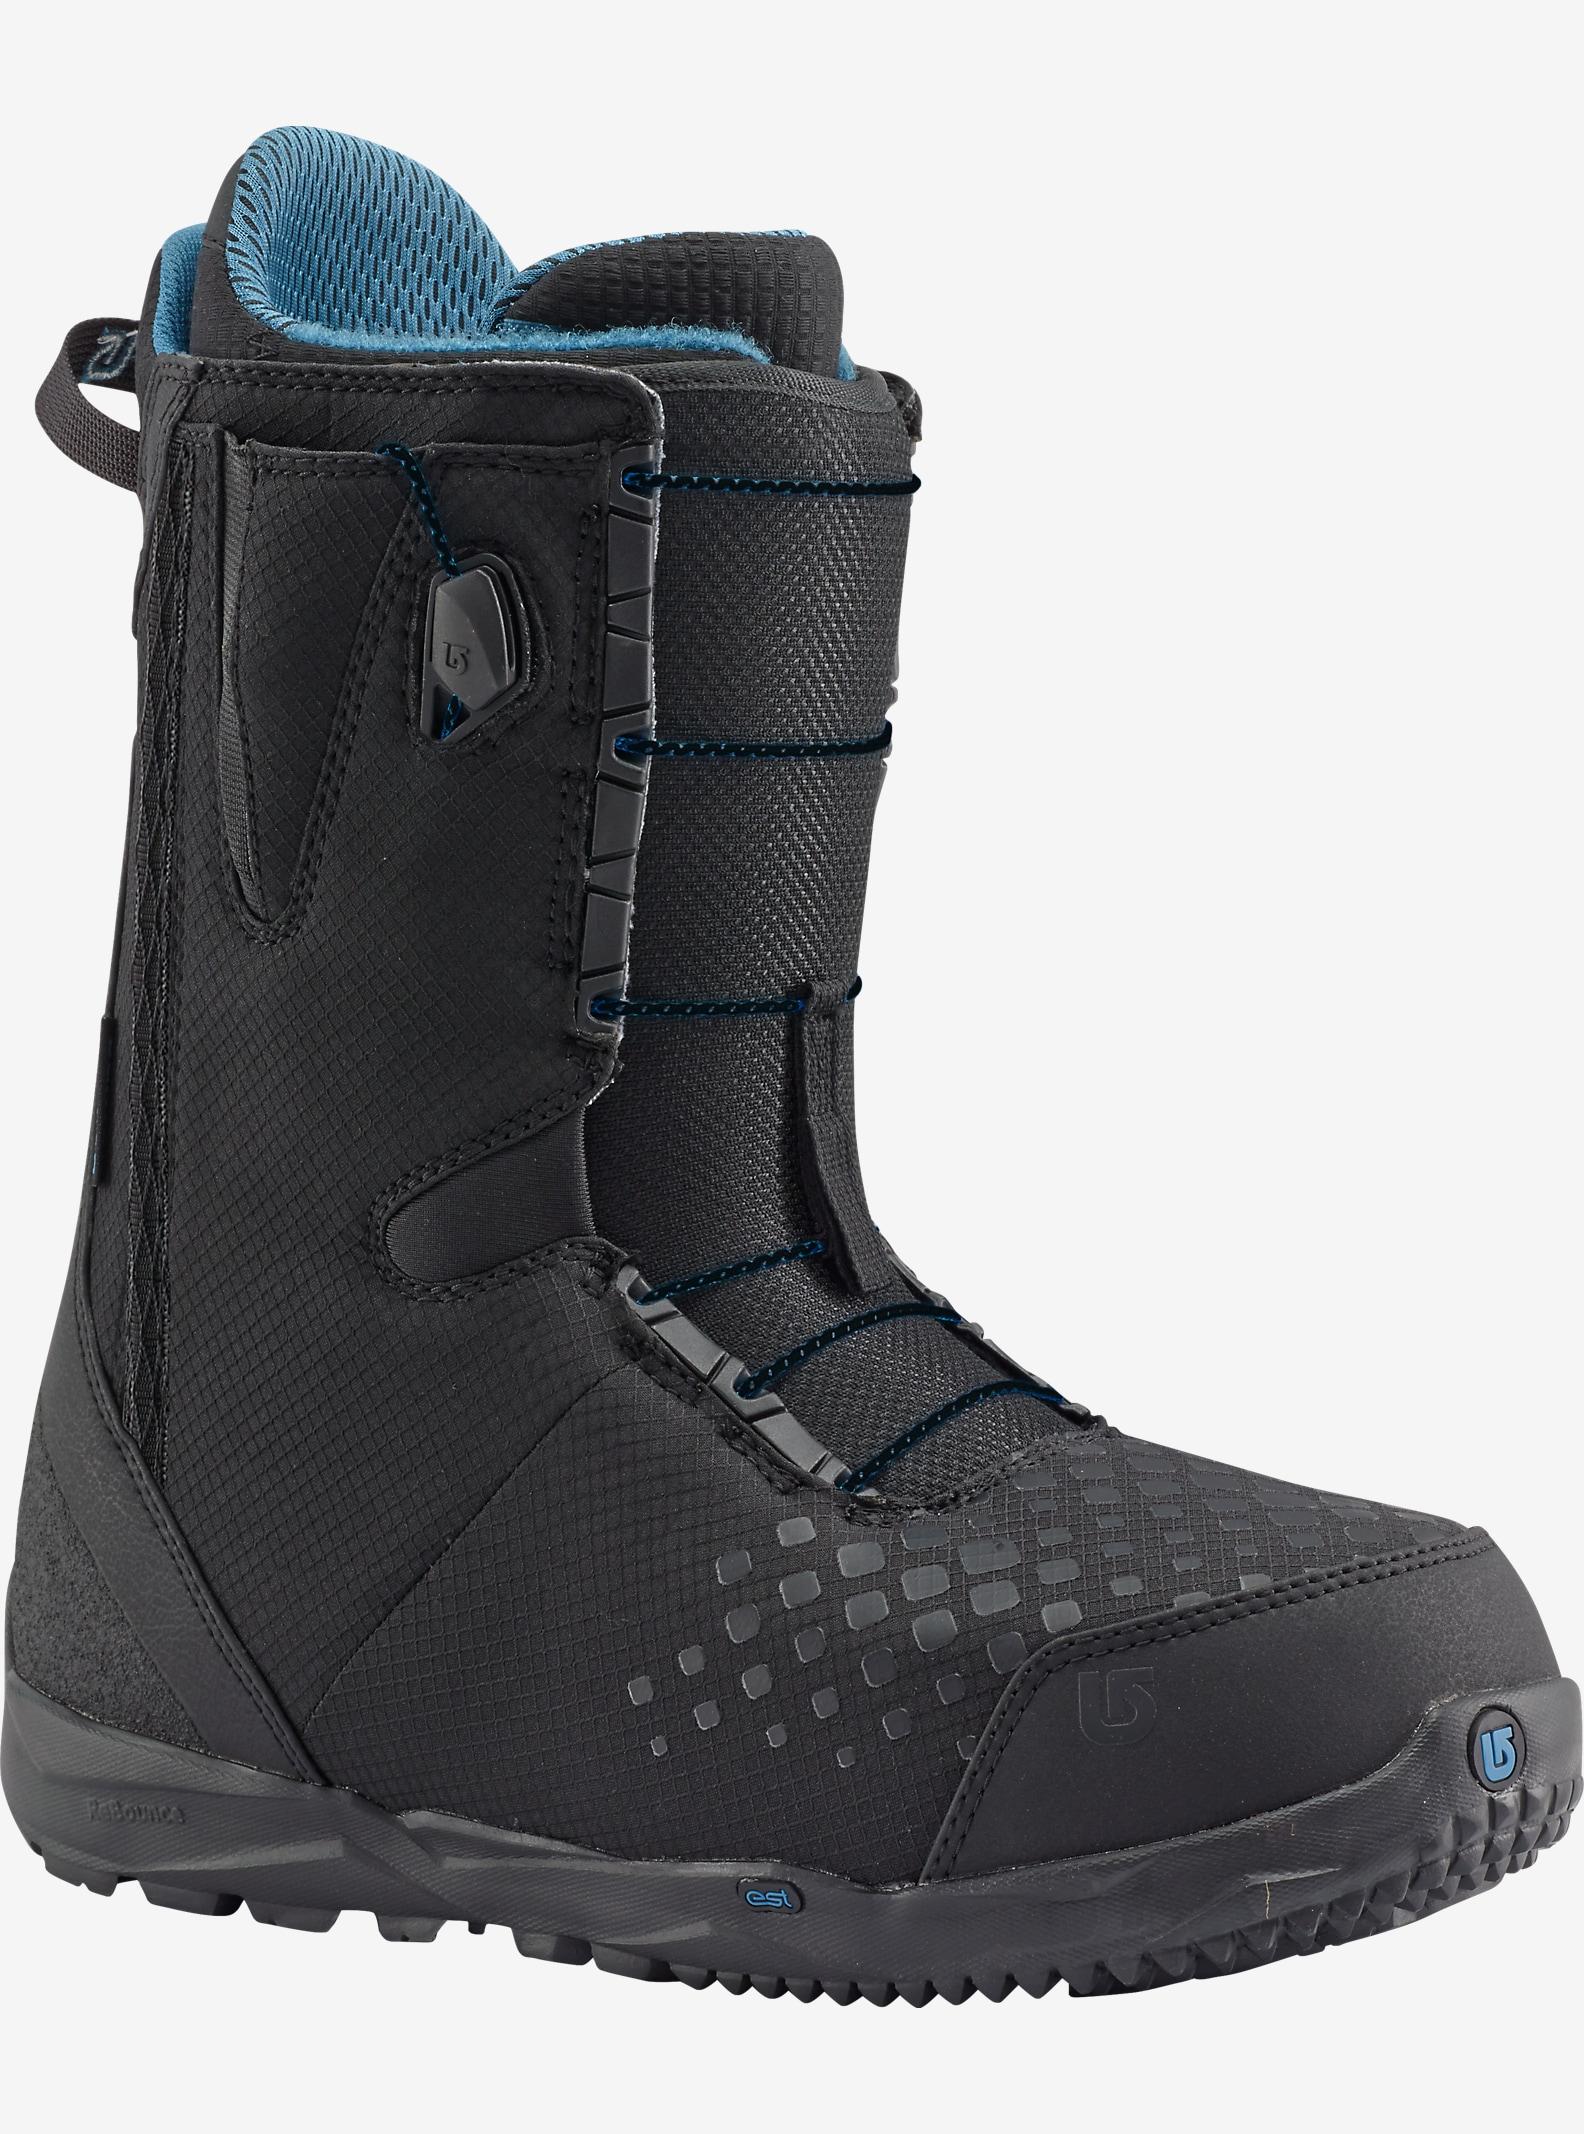 Burton Stash Hunter Snowboard Boot shown in Black / Blue